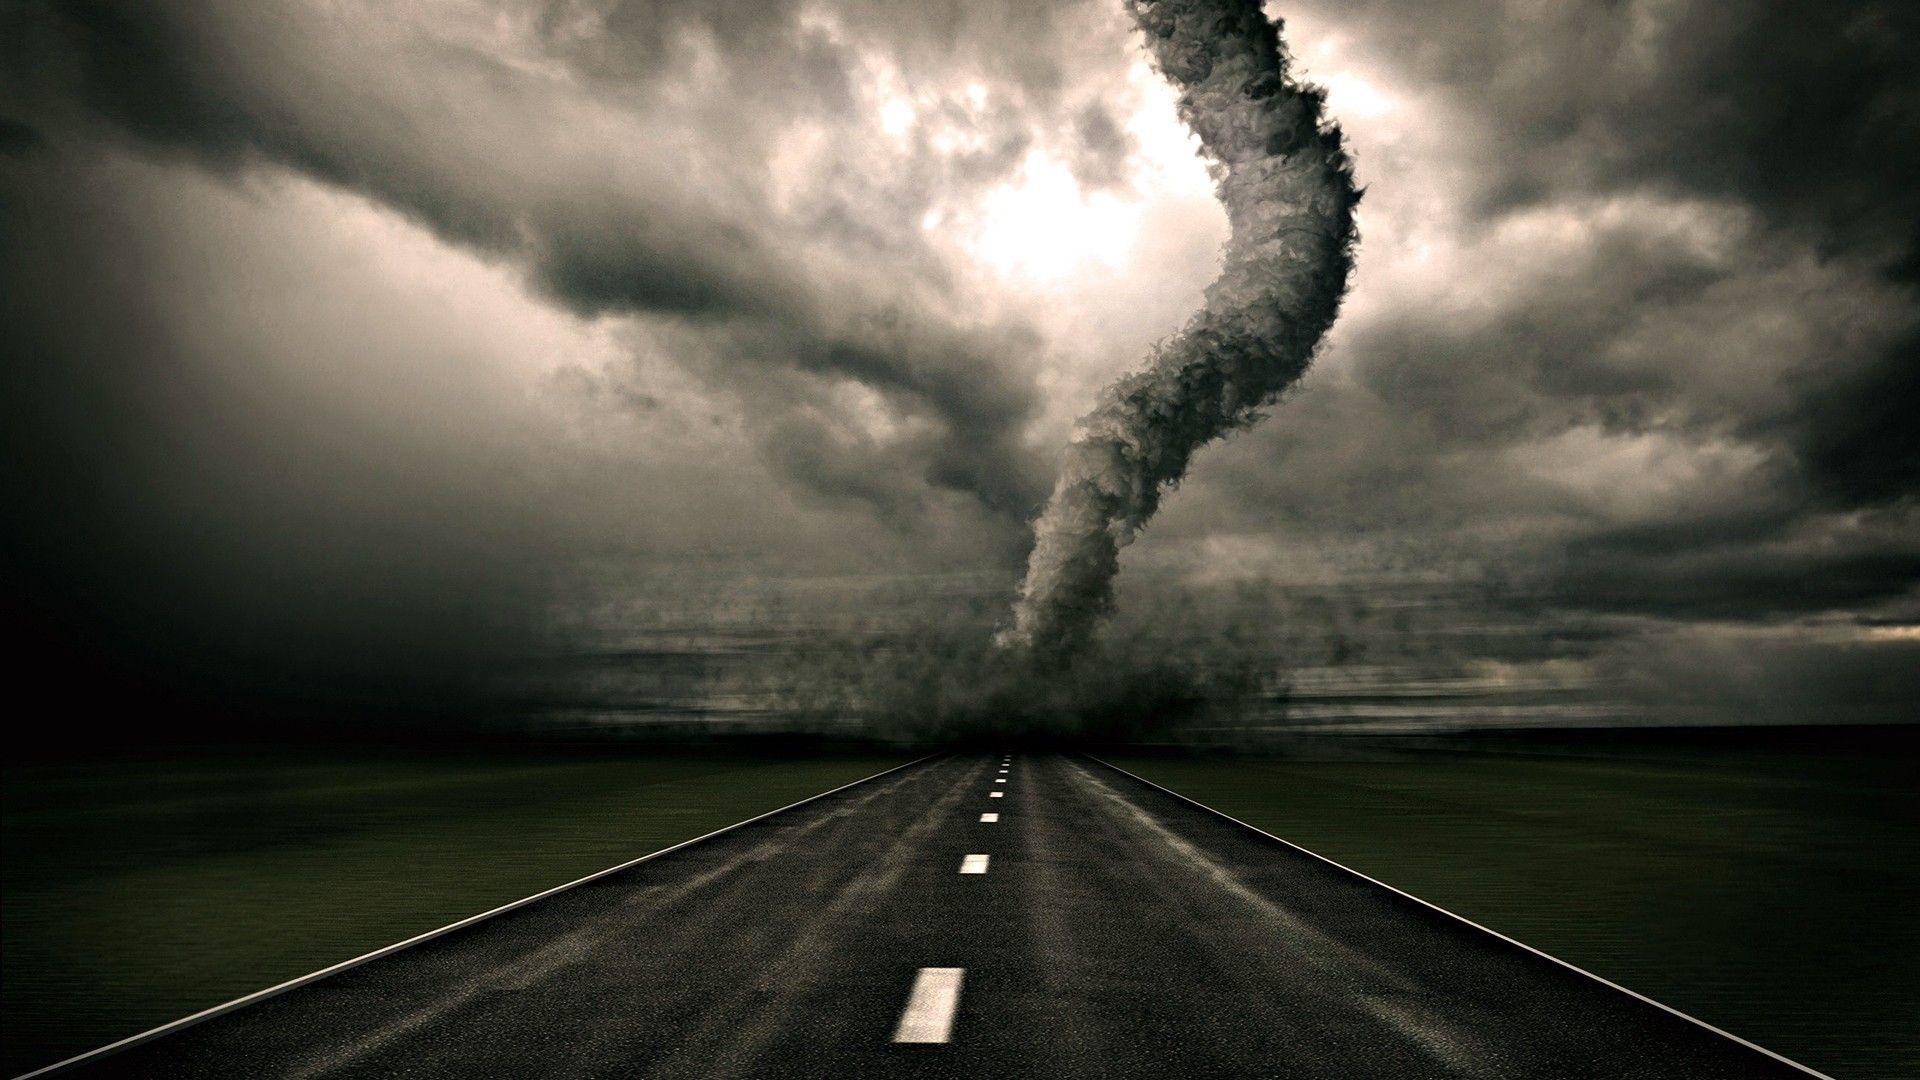 Storm on road wallpaper